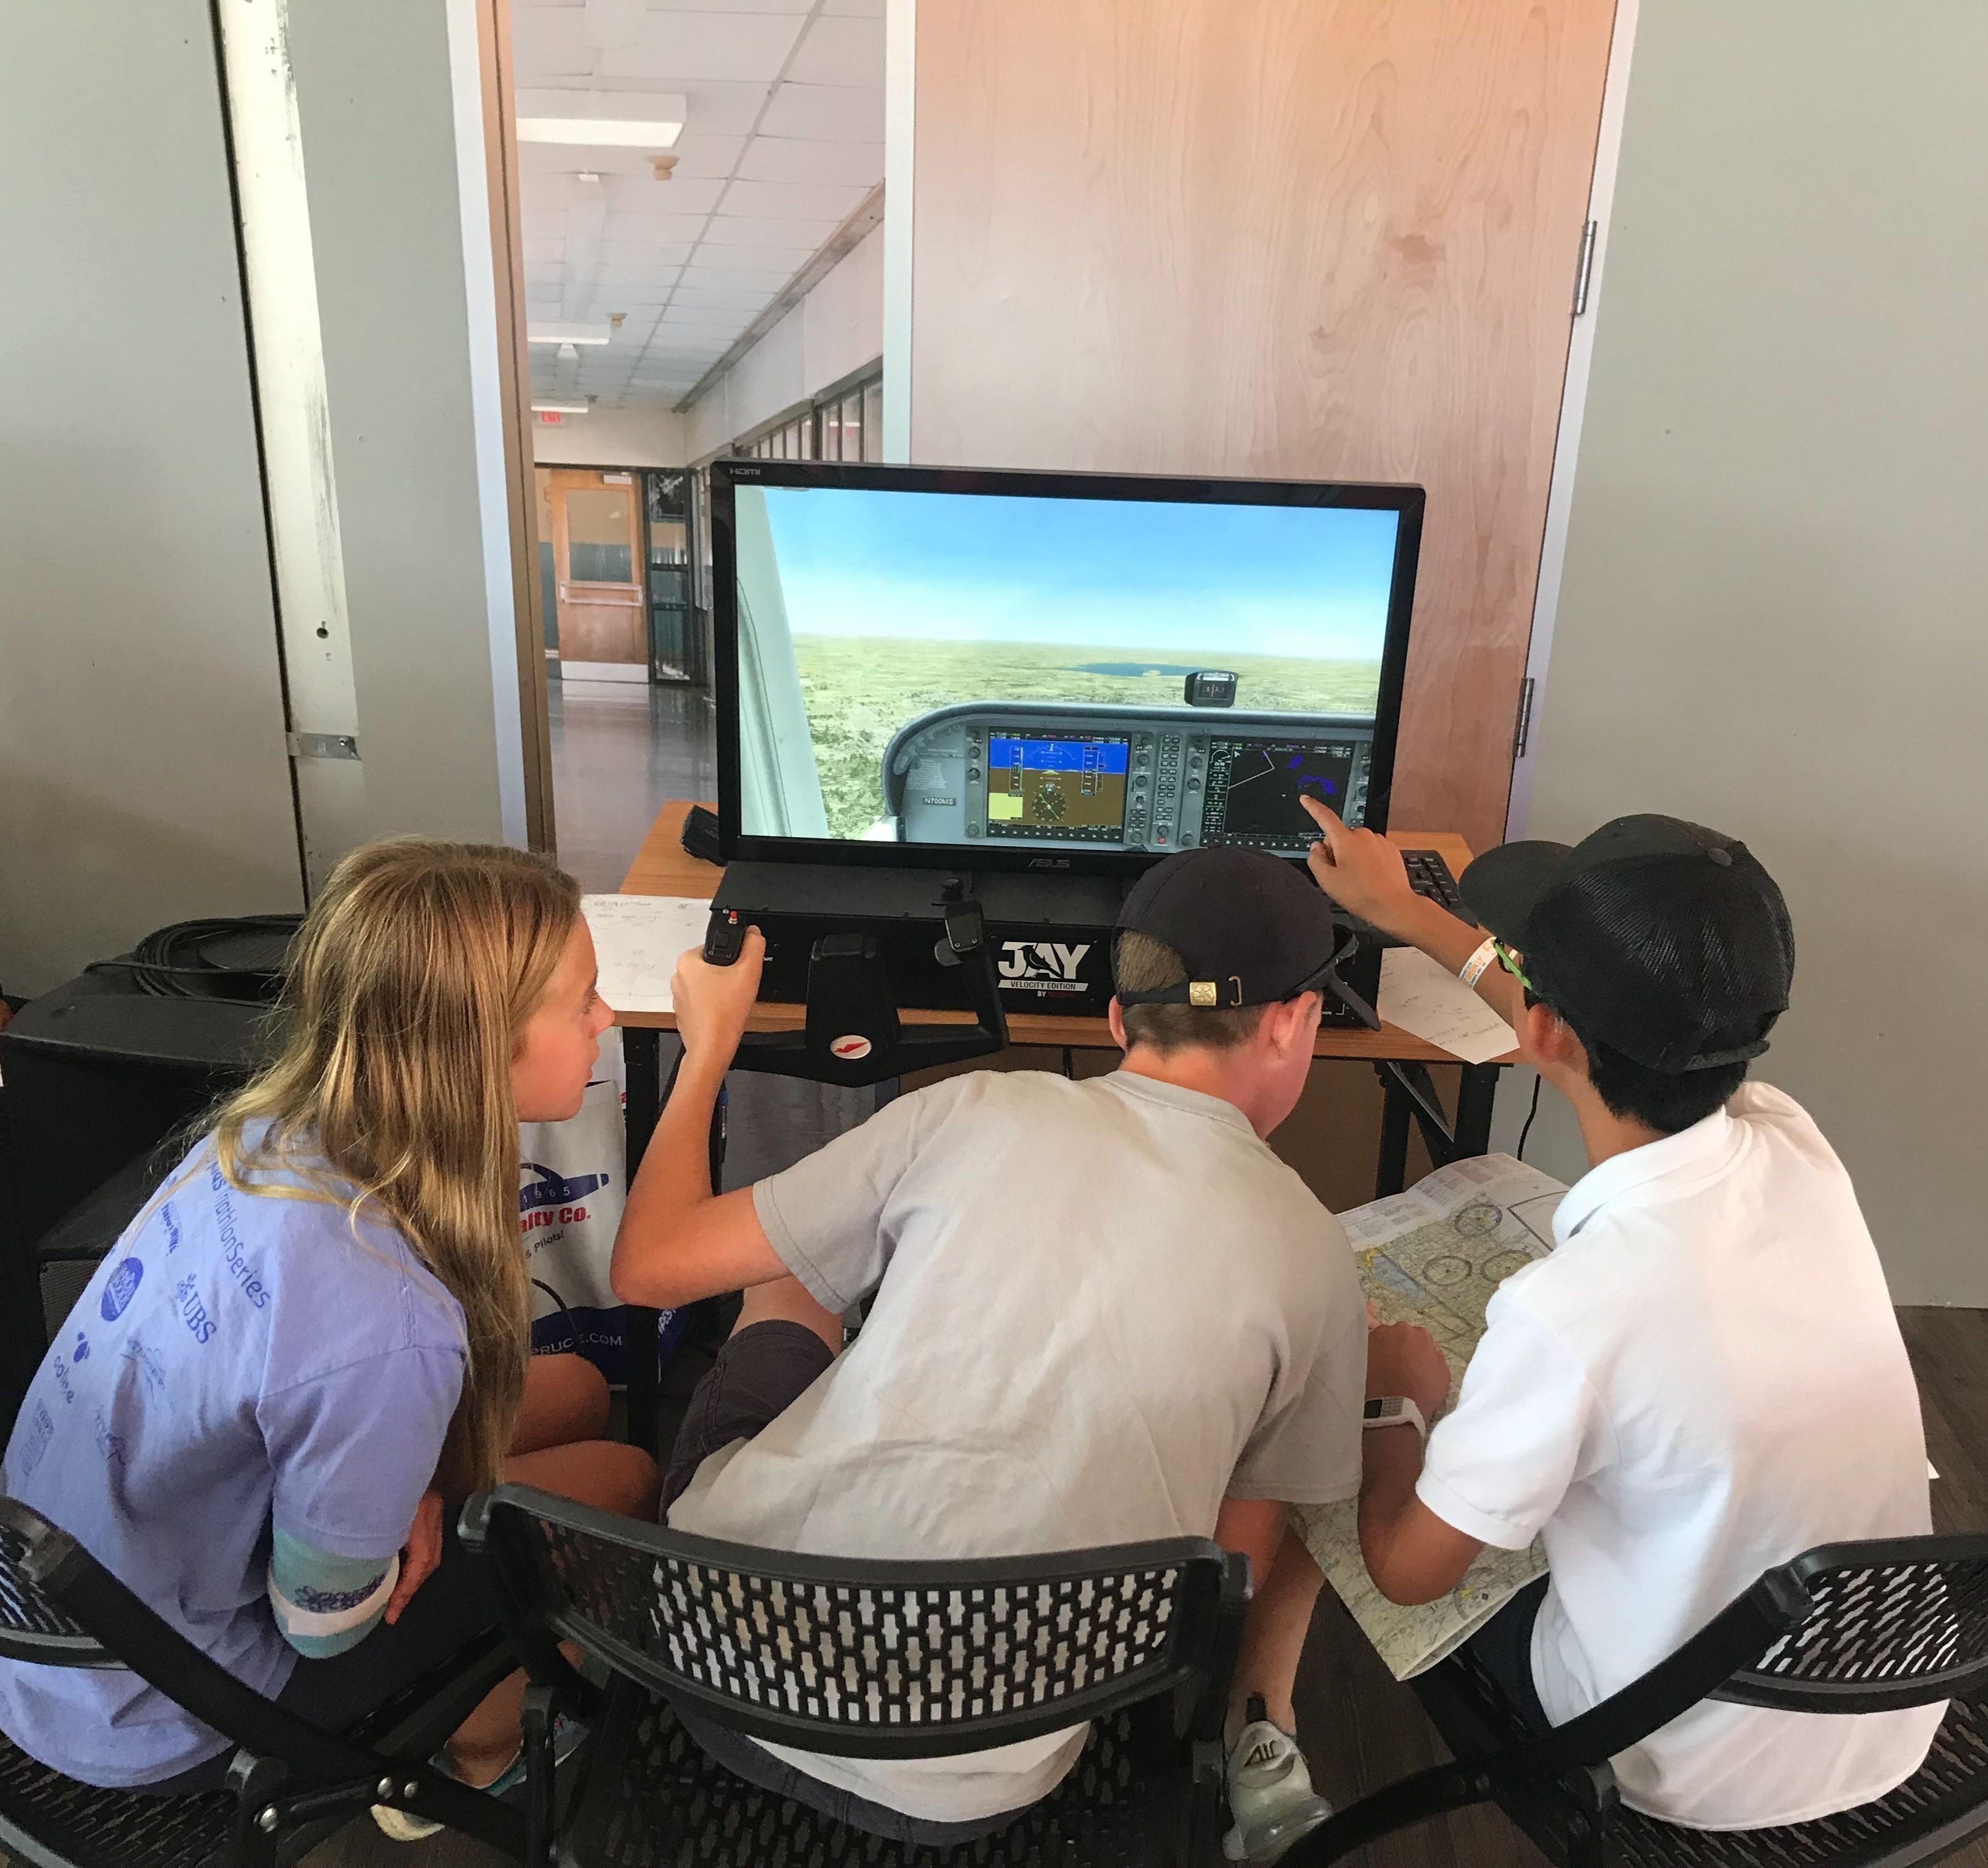 Students in the Redbird STEM Lab at AirVenture